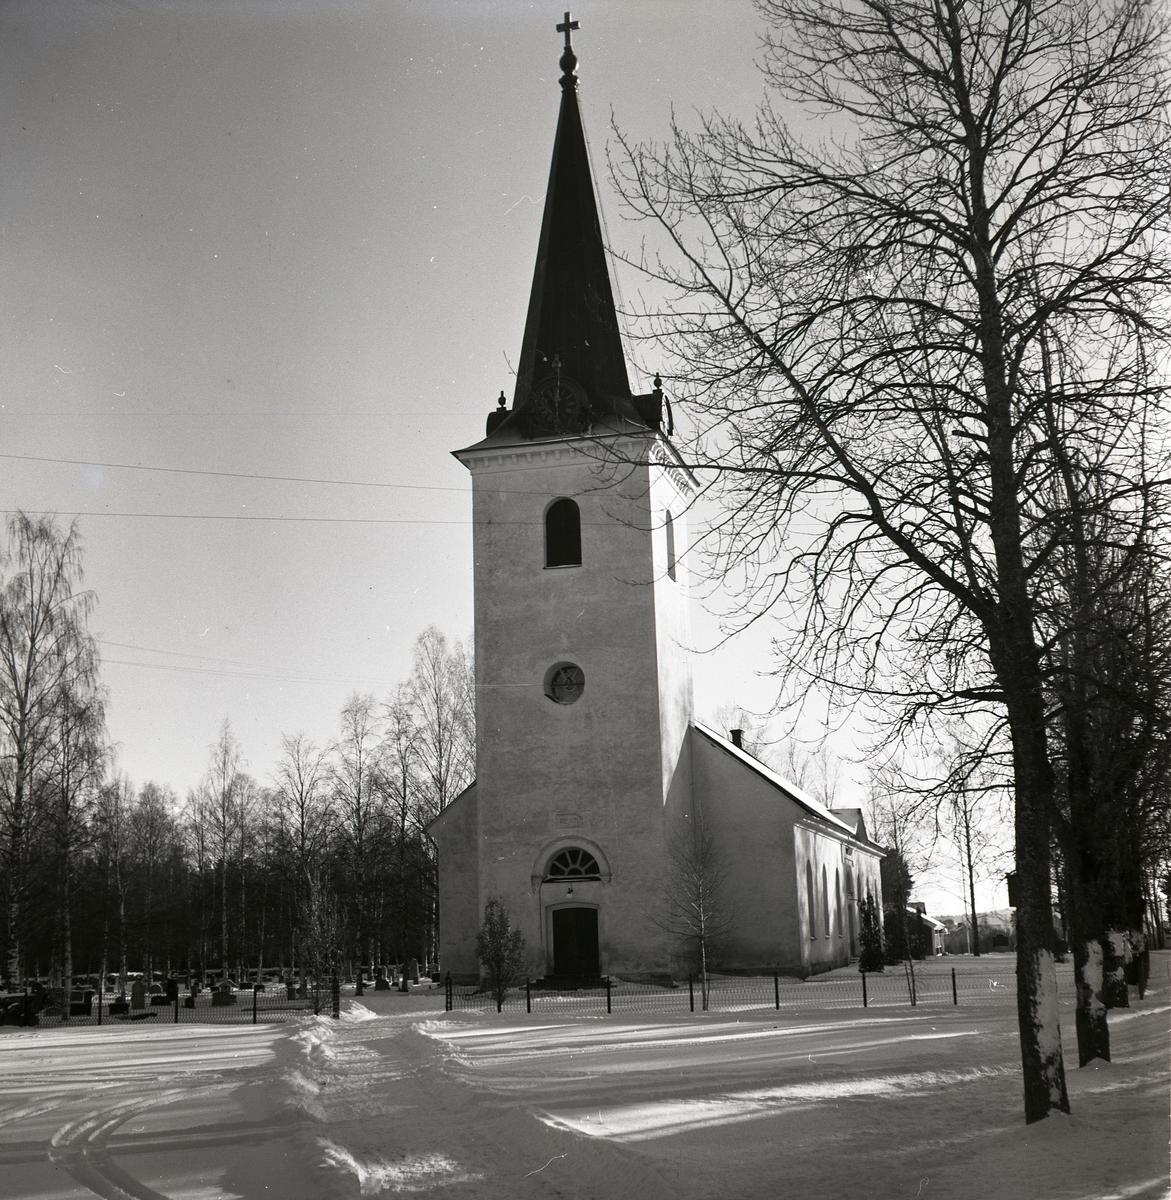 Mo kyrka i vinterskrud.